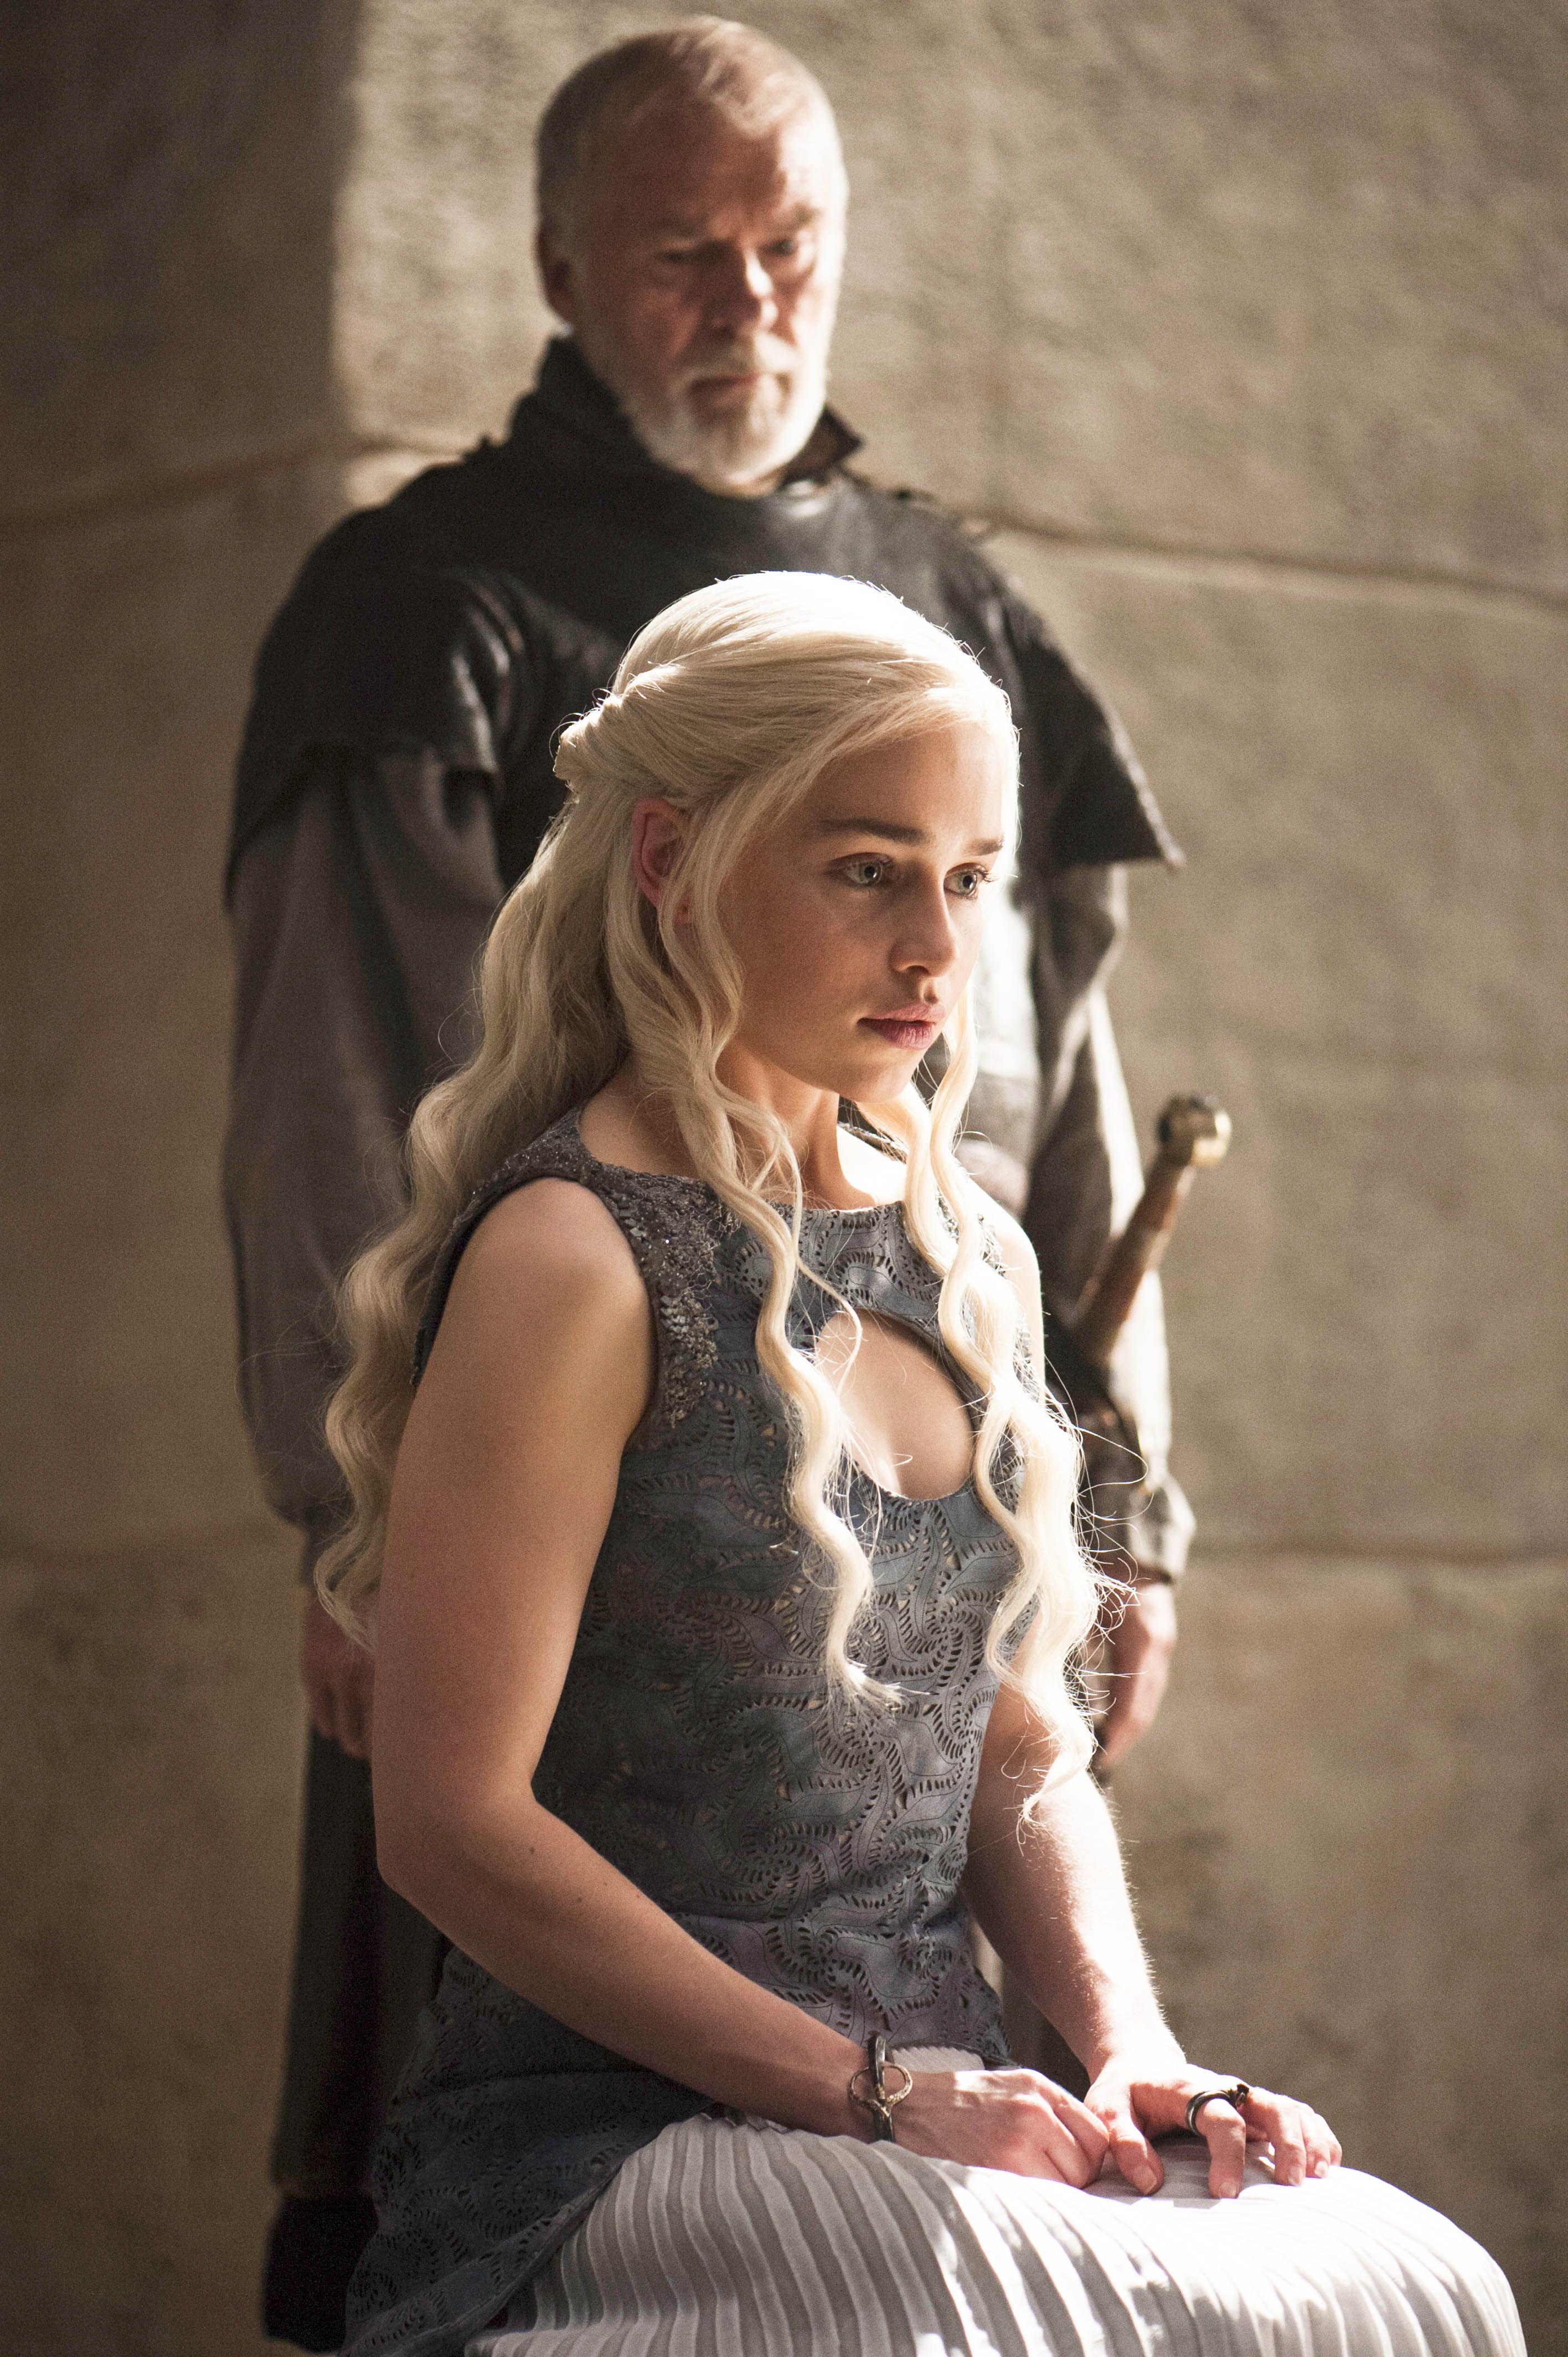 Emilia Clarke as Daenerys Targaryen and Ian McElhinney as